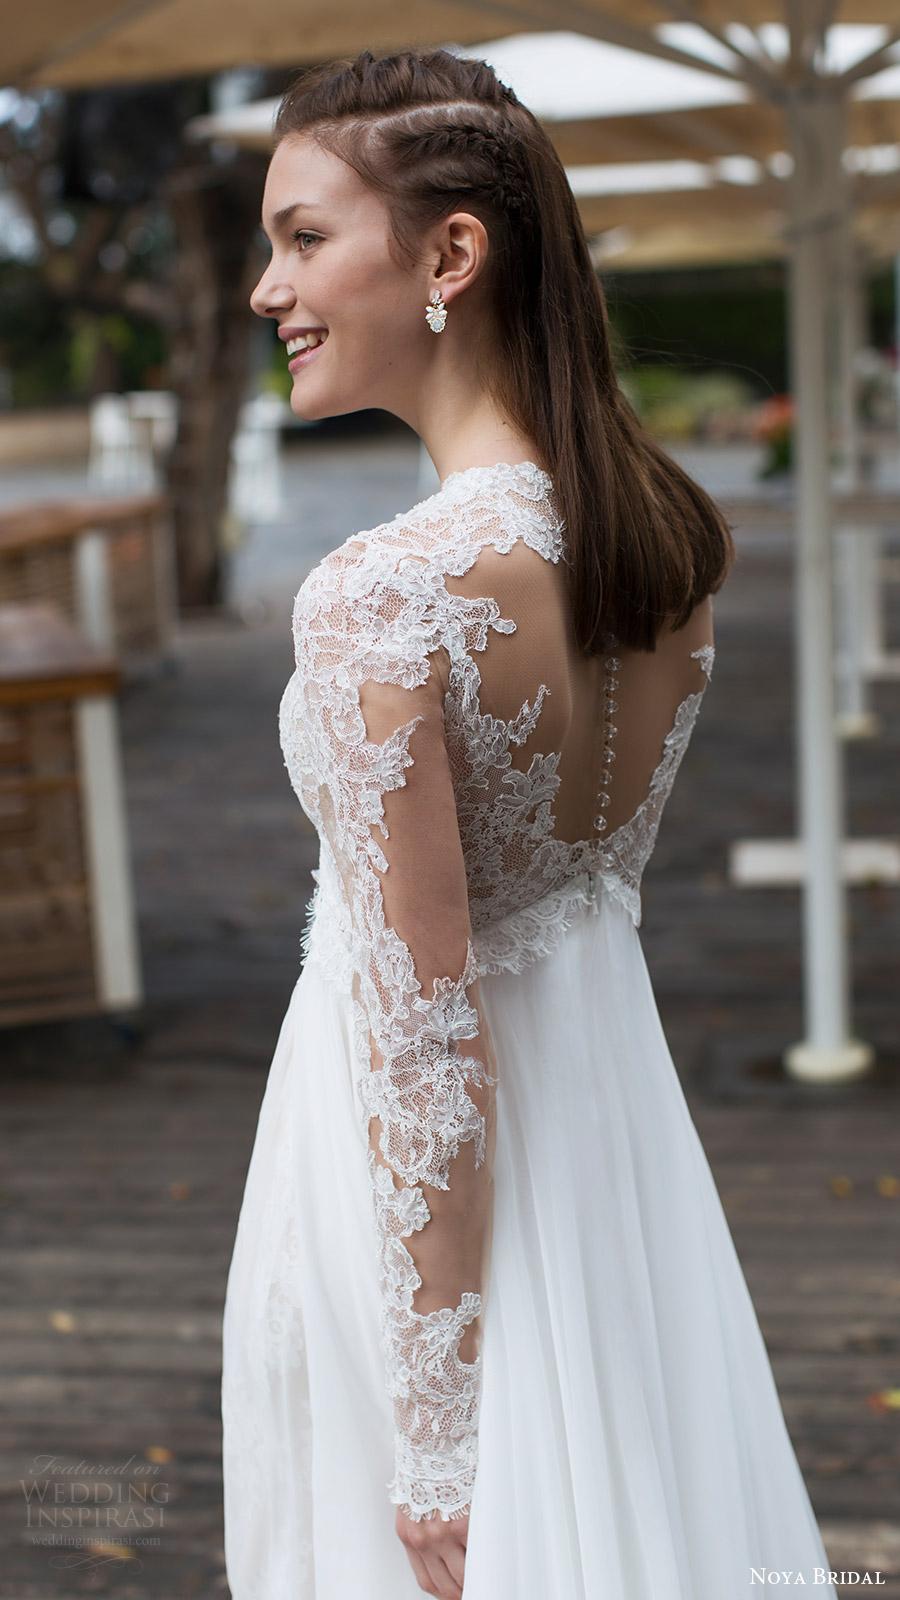 noya bridal 2016 3 long sleeves sweetheart illusion jewel neck trumpet sheath lace wedding dress (1208) bv sheer back overskirt train romantic